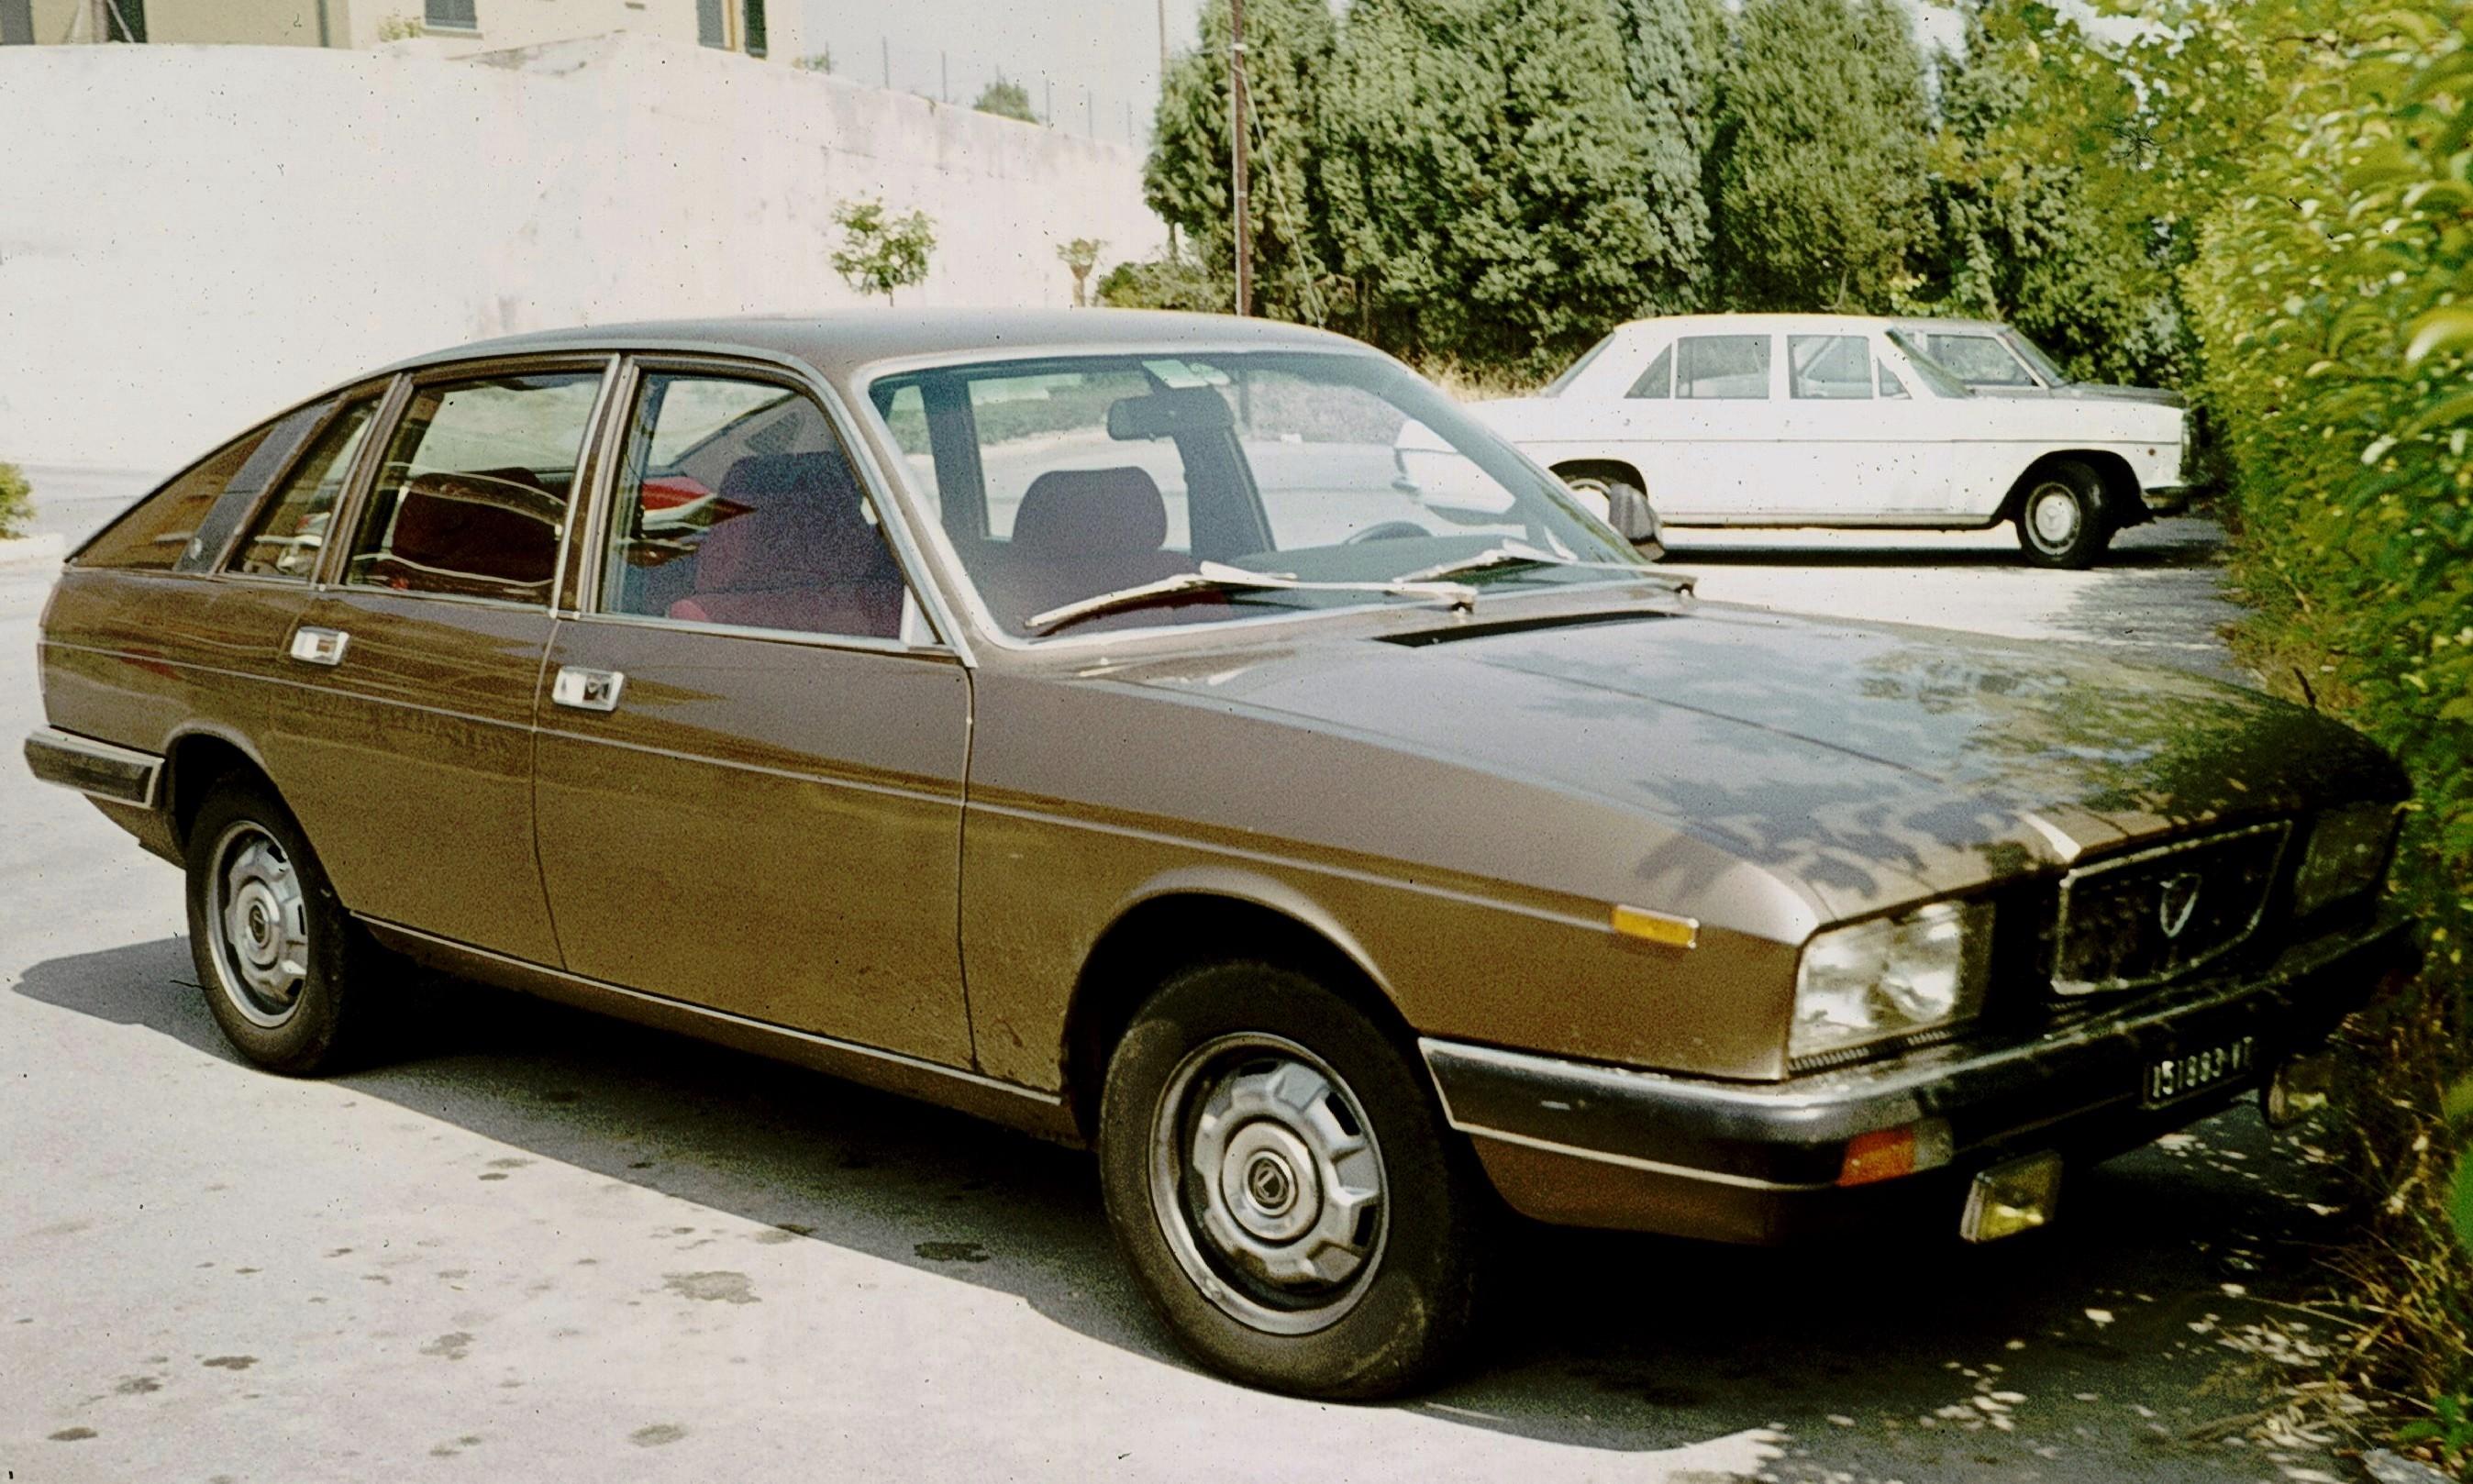 https://upload.wikimedia.org/wikipedia/commons/5/51/Lancia_Gamma_di_Viterbo.jpg